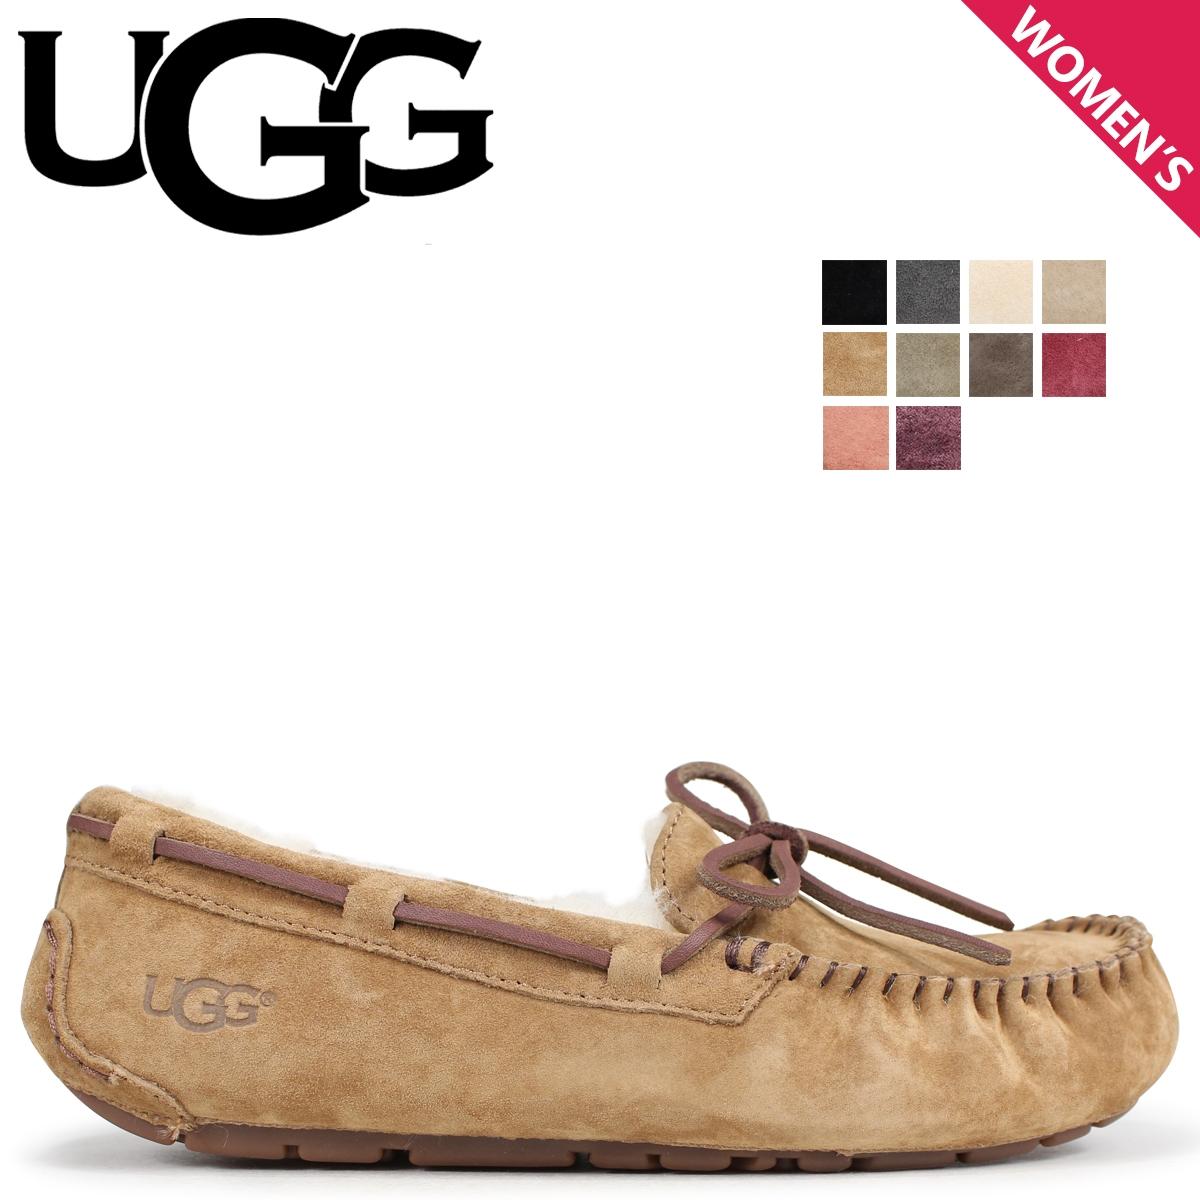 d3f654a4fb3 アグ UGG moccasins Dakota mouton shoes Lady's sheepskin WOMENS DAKOTA 5612  [the 7/6 additional arrival]